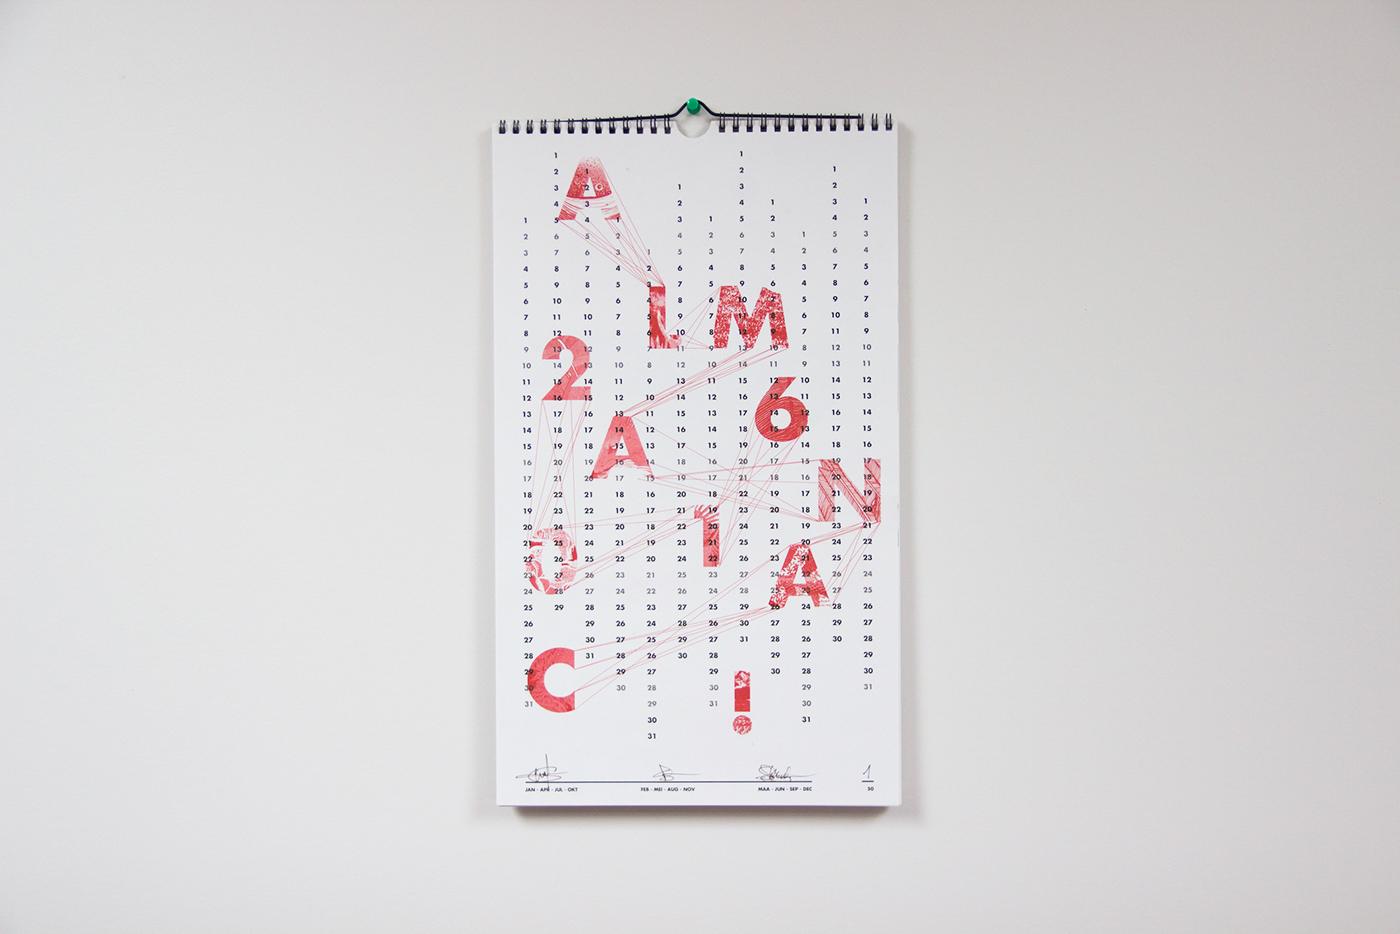 collage almanac Project Riso print ILLUSTRATION  calendar year Risoprint